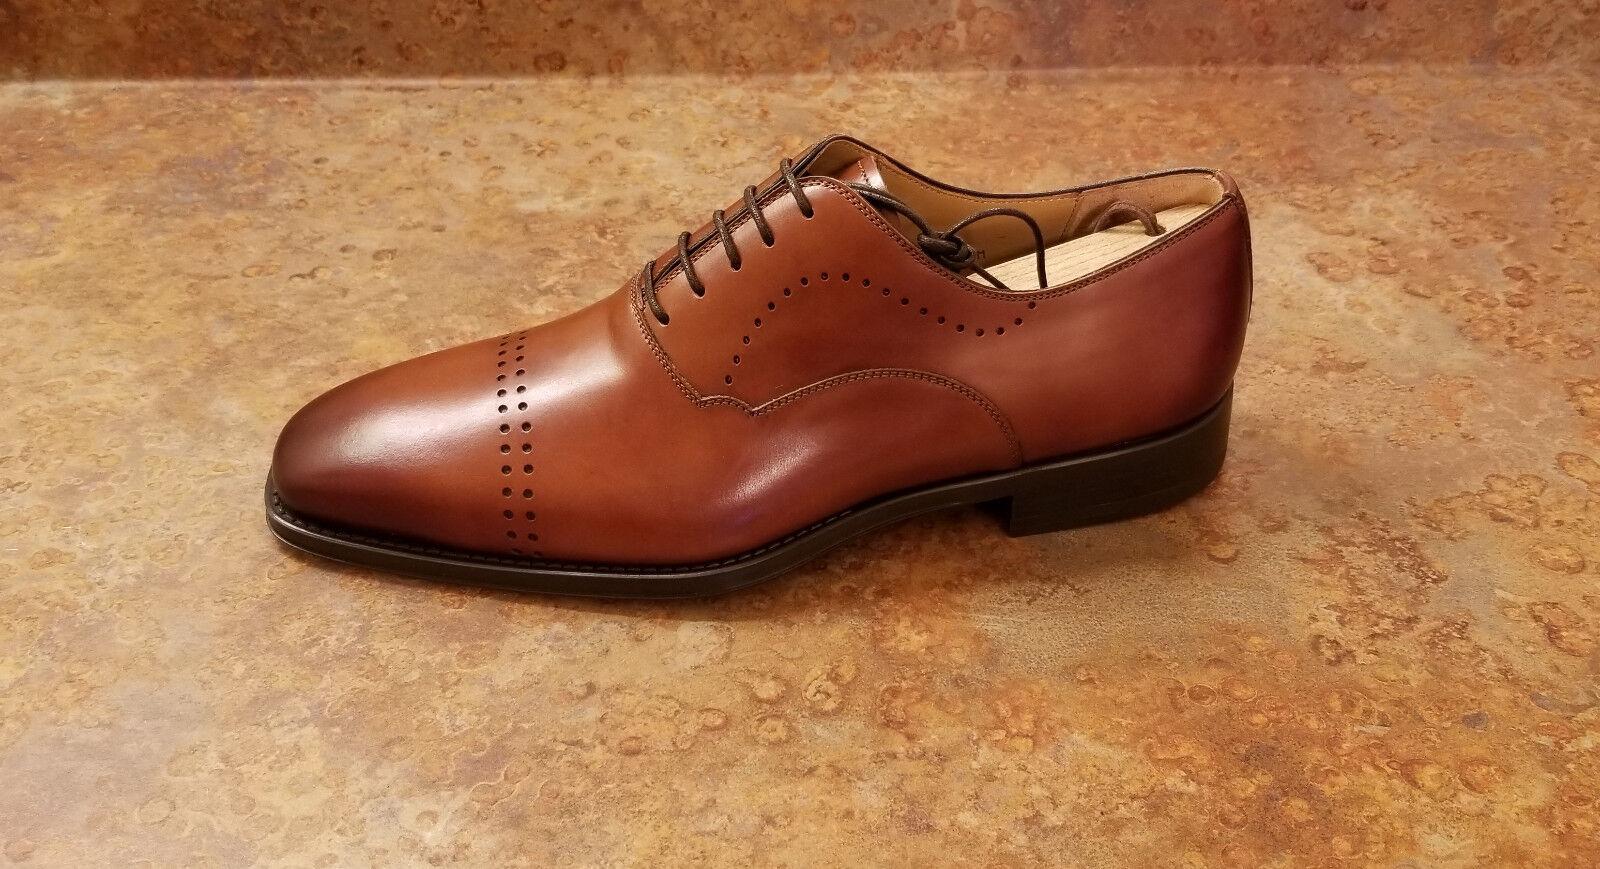 New  Magnanni 'Cedric' Oxford scarpe Cognac Marroneee Leather Mens 7.5 M MSRP  325